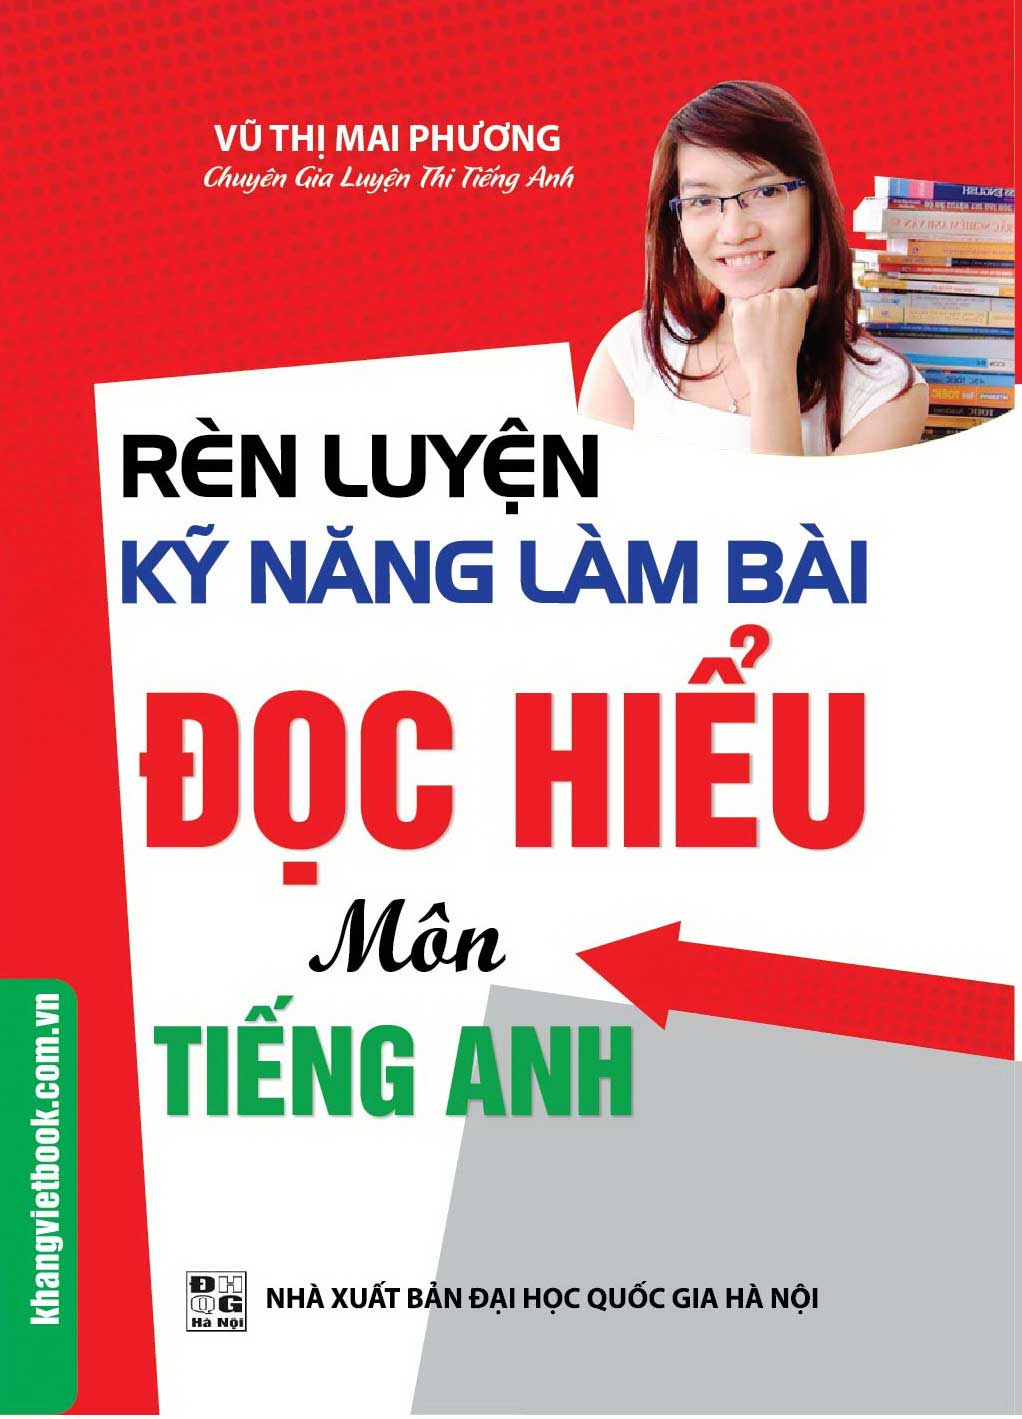 https://newshop.vn/public/uploads/products/2365/renluyenkynanglambaidochieumontienganhtangkemhandbook1.jpg